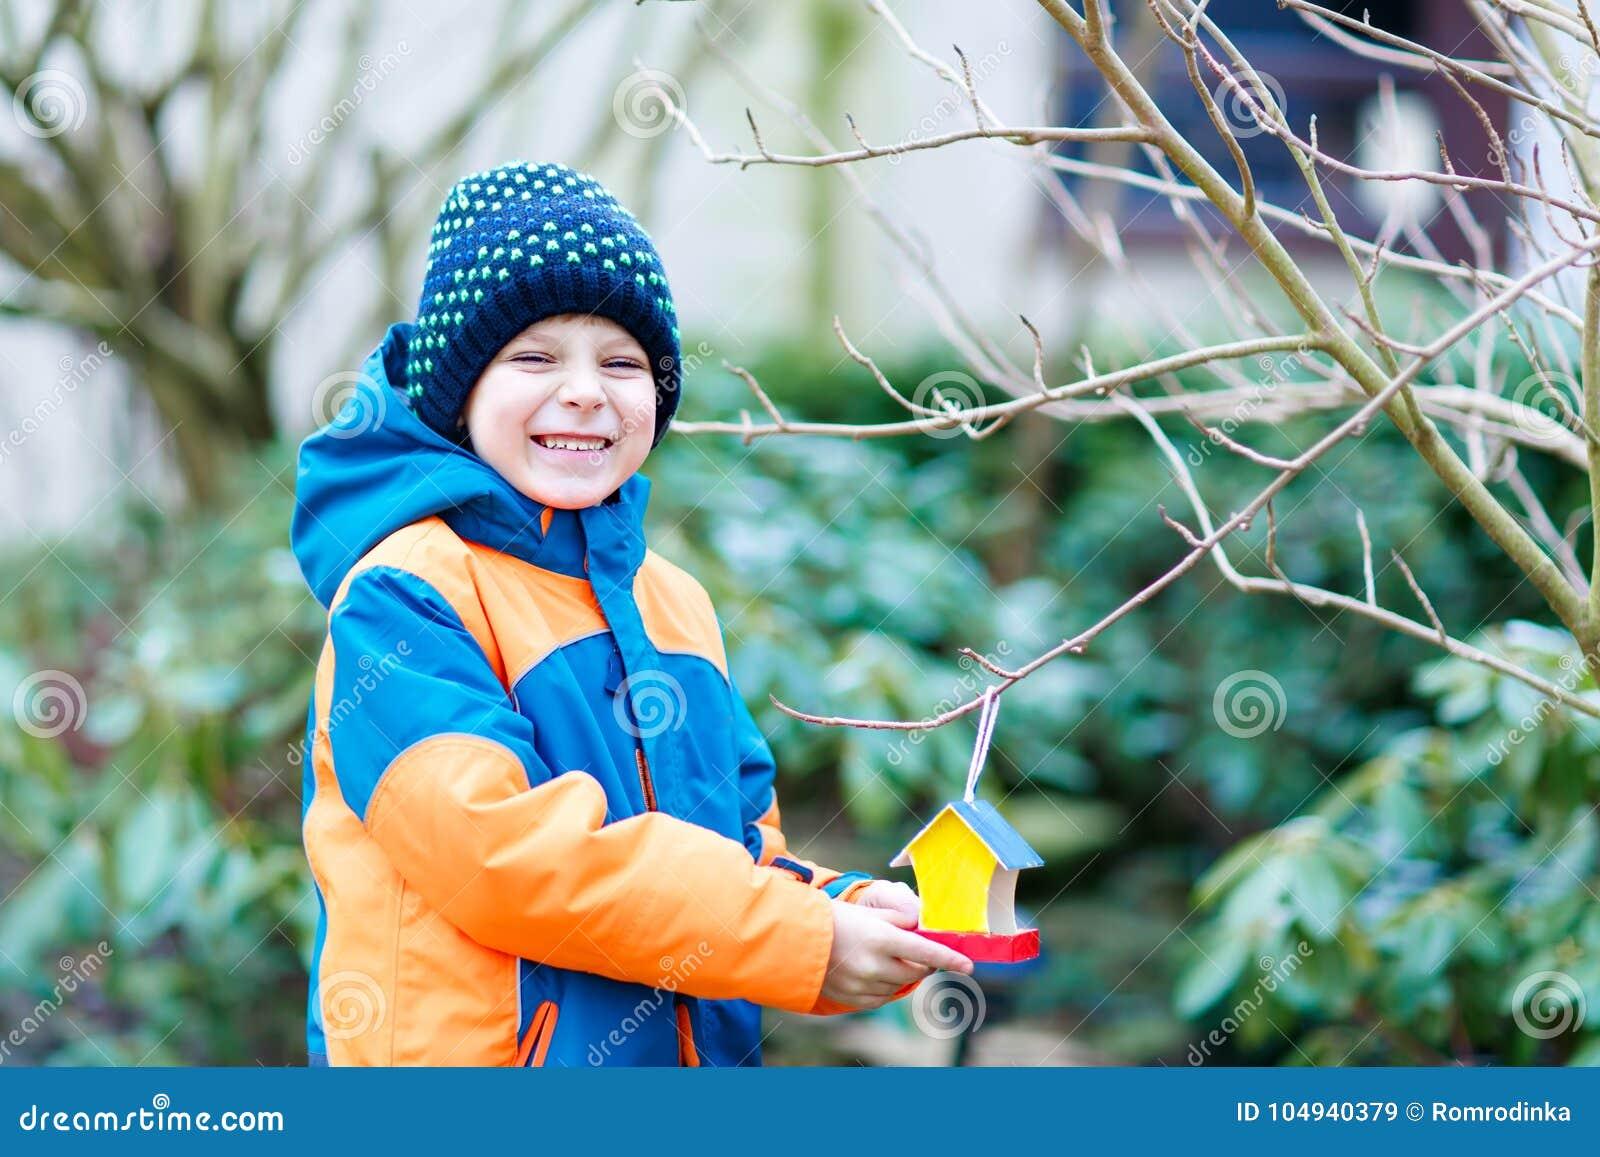 Magnificent Little Kid Boy Hanging Bird House On Tree For Feeding In Download Free Architecture Designs Scobabritishbridgeorg